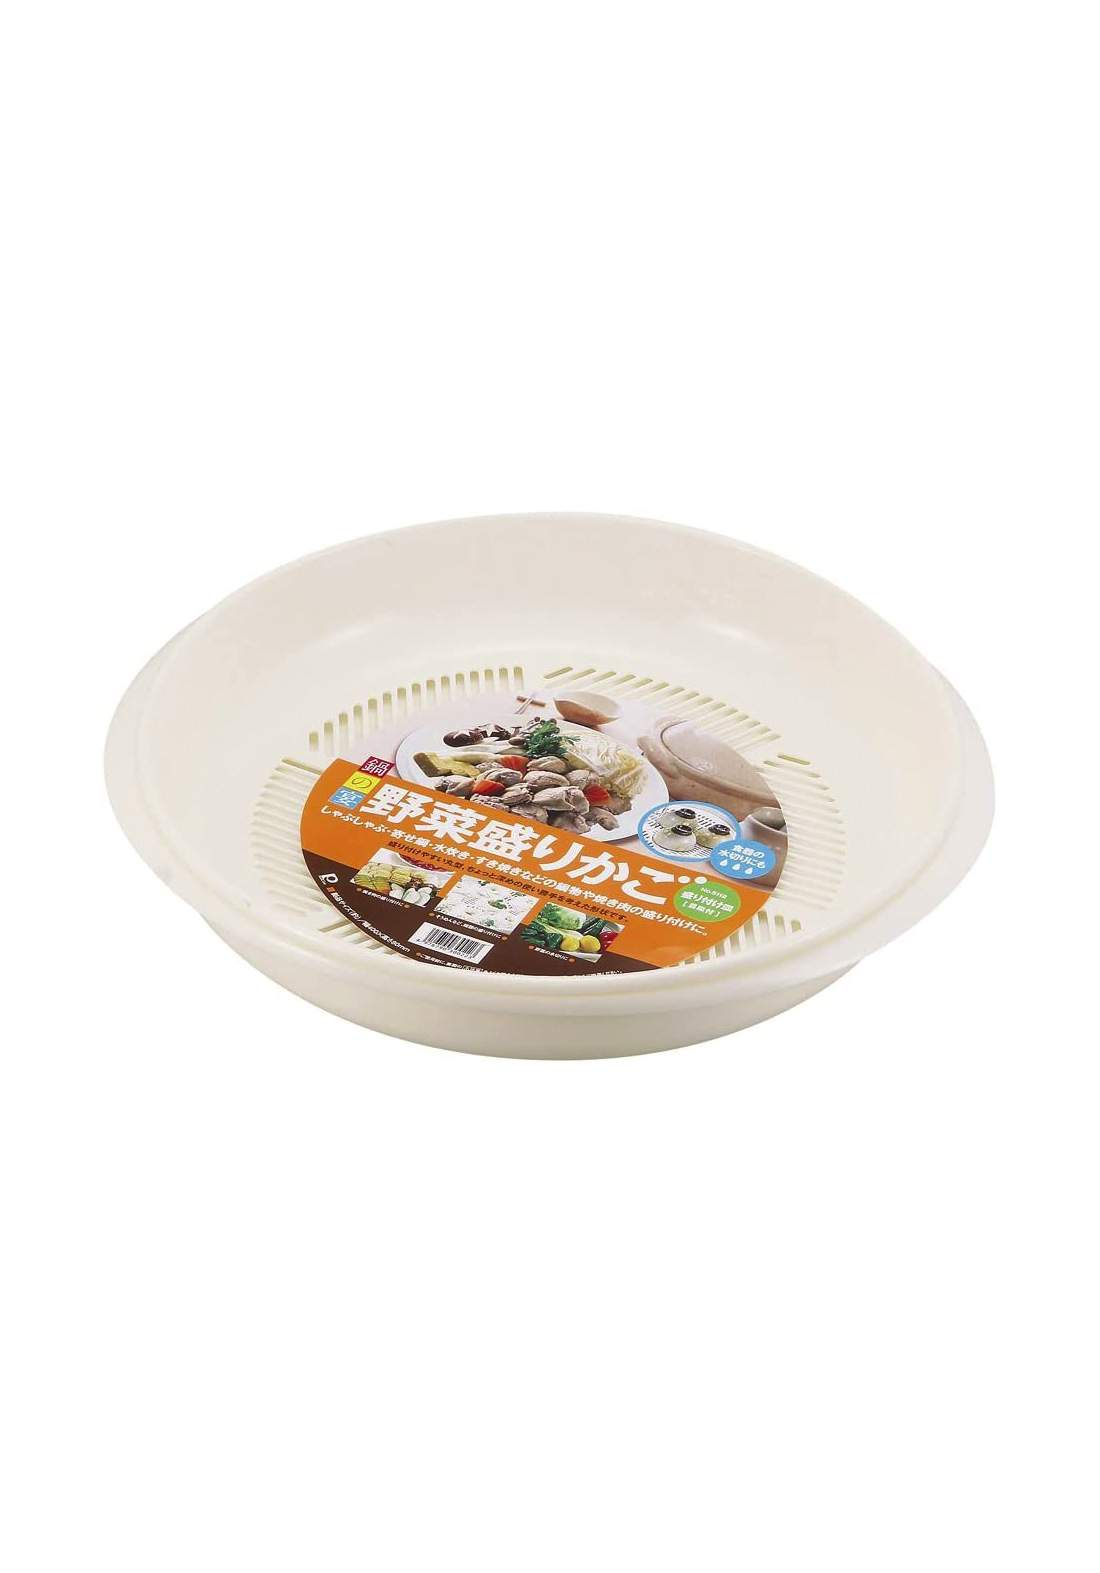 Pearl Metal H-5112 Pot Banquet Vegetable Serving Basket سلة متعددة الأستخدام